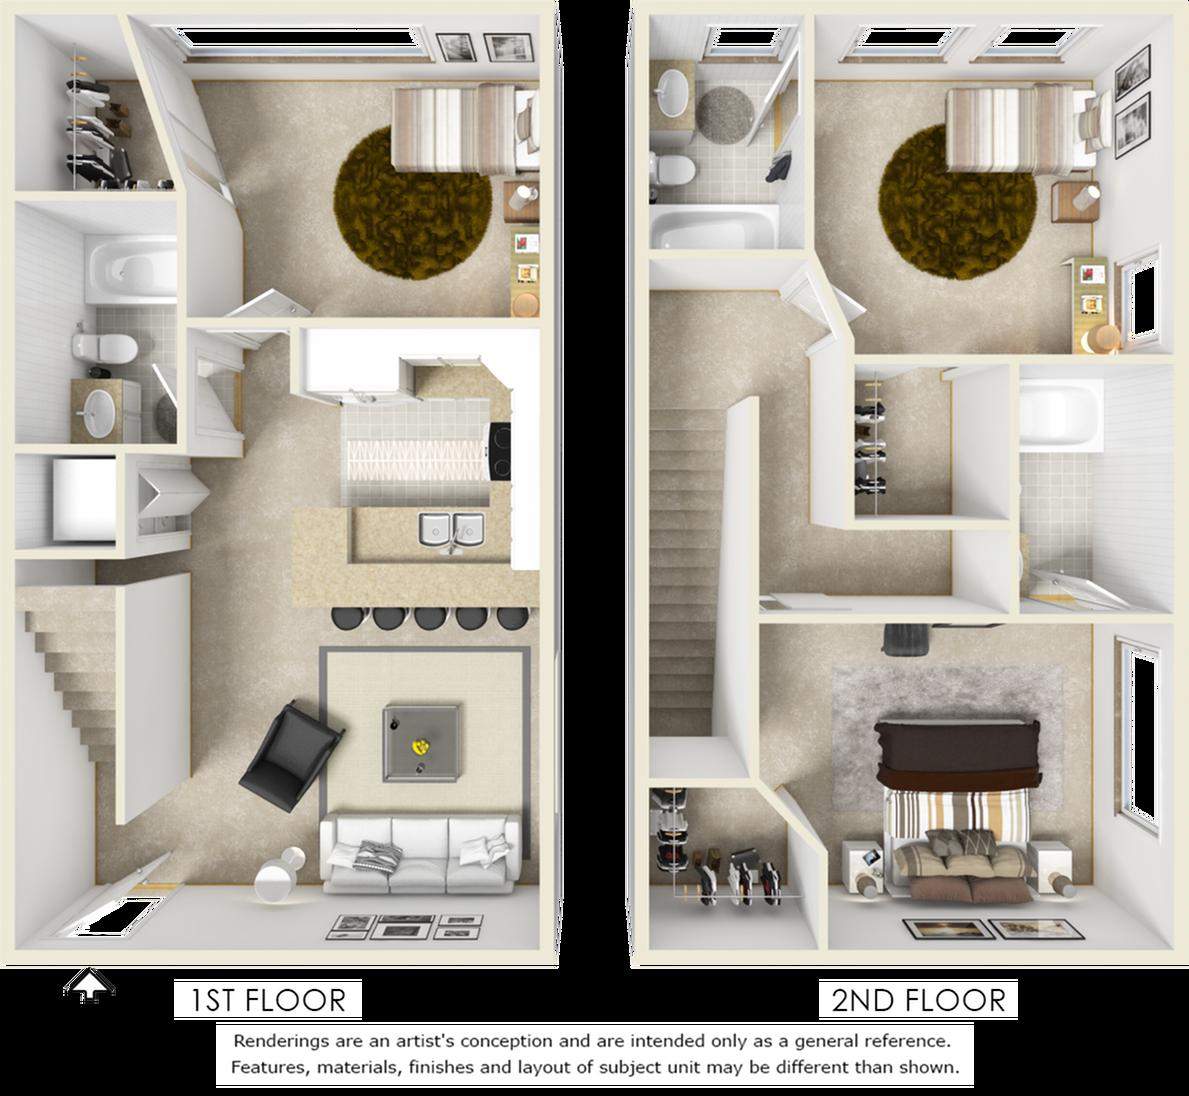 Williamsburg 3 bedroom 3 bathroom floor plan